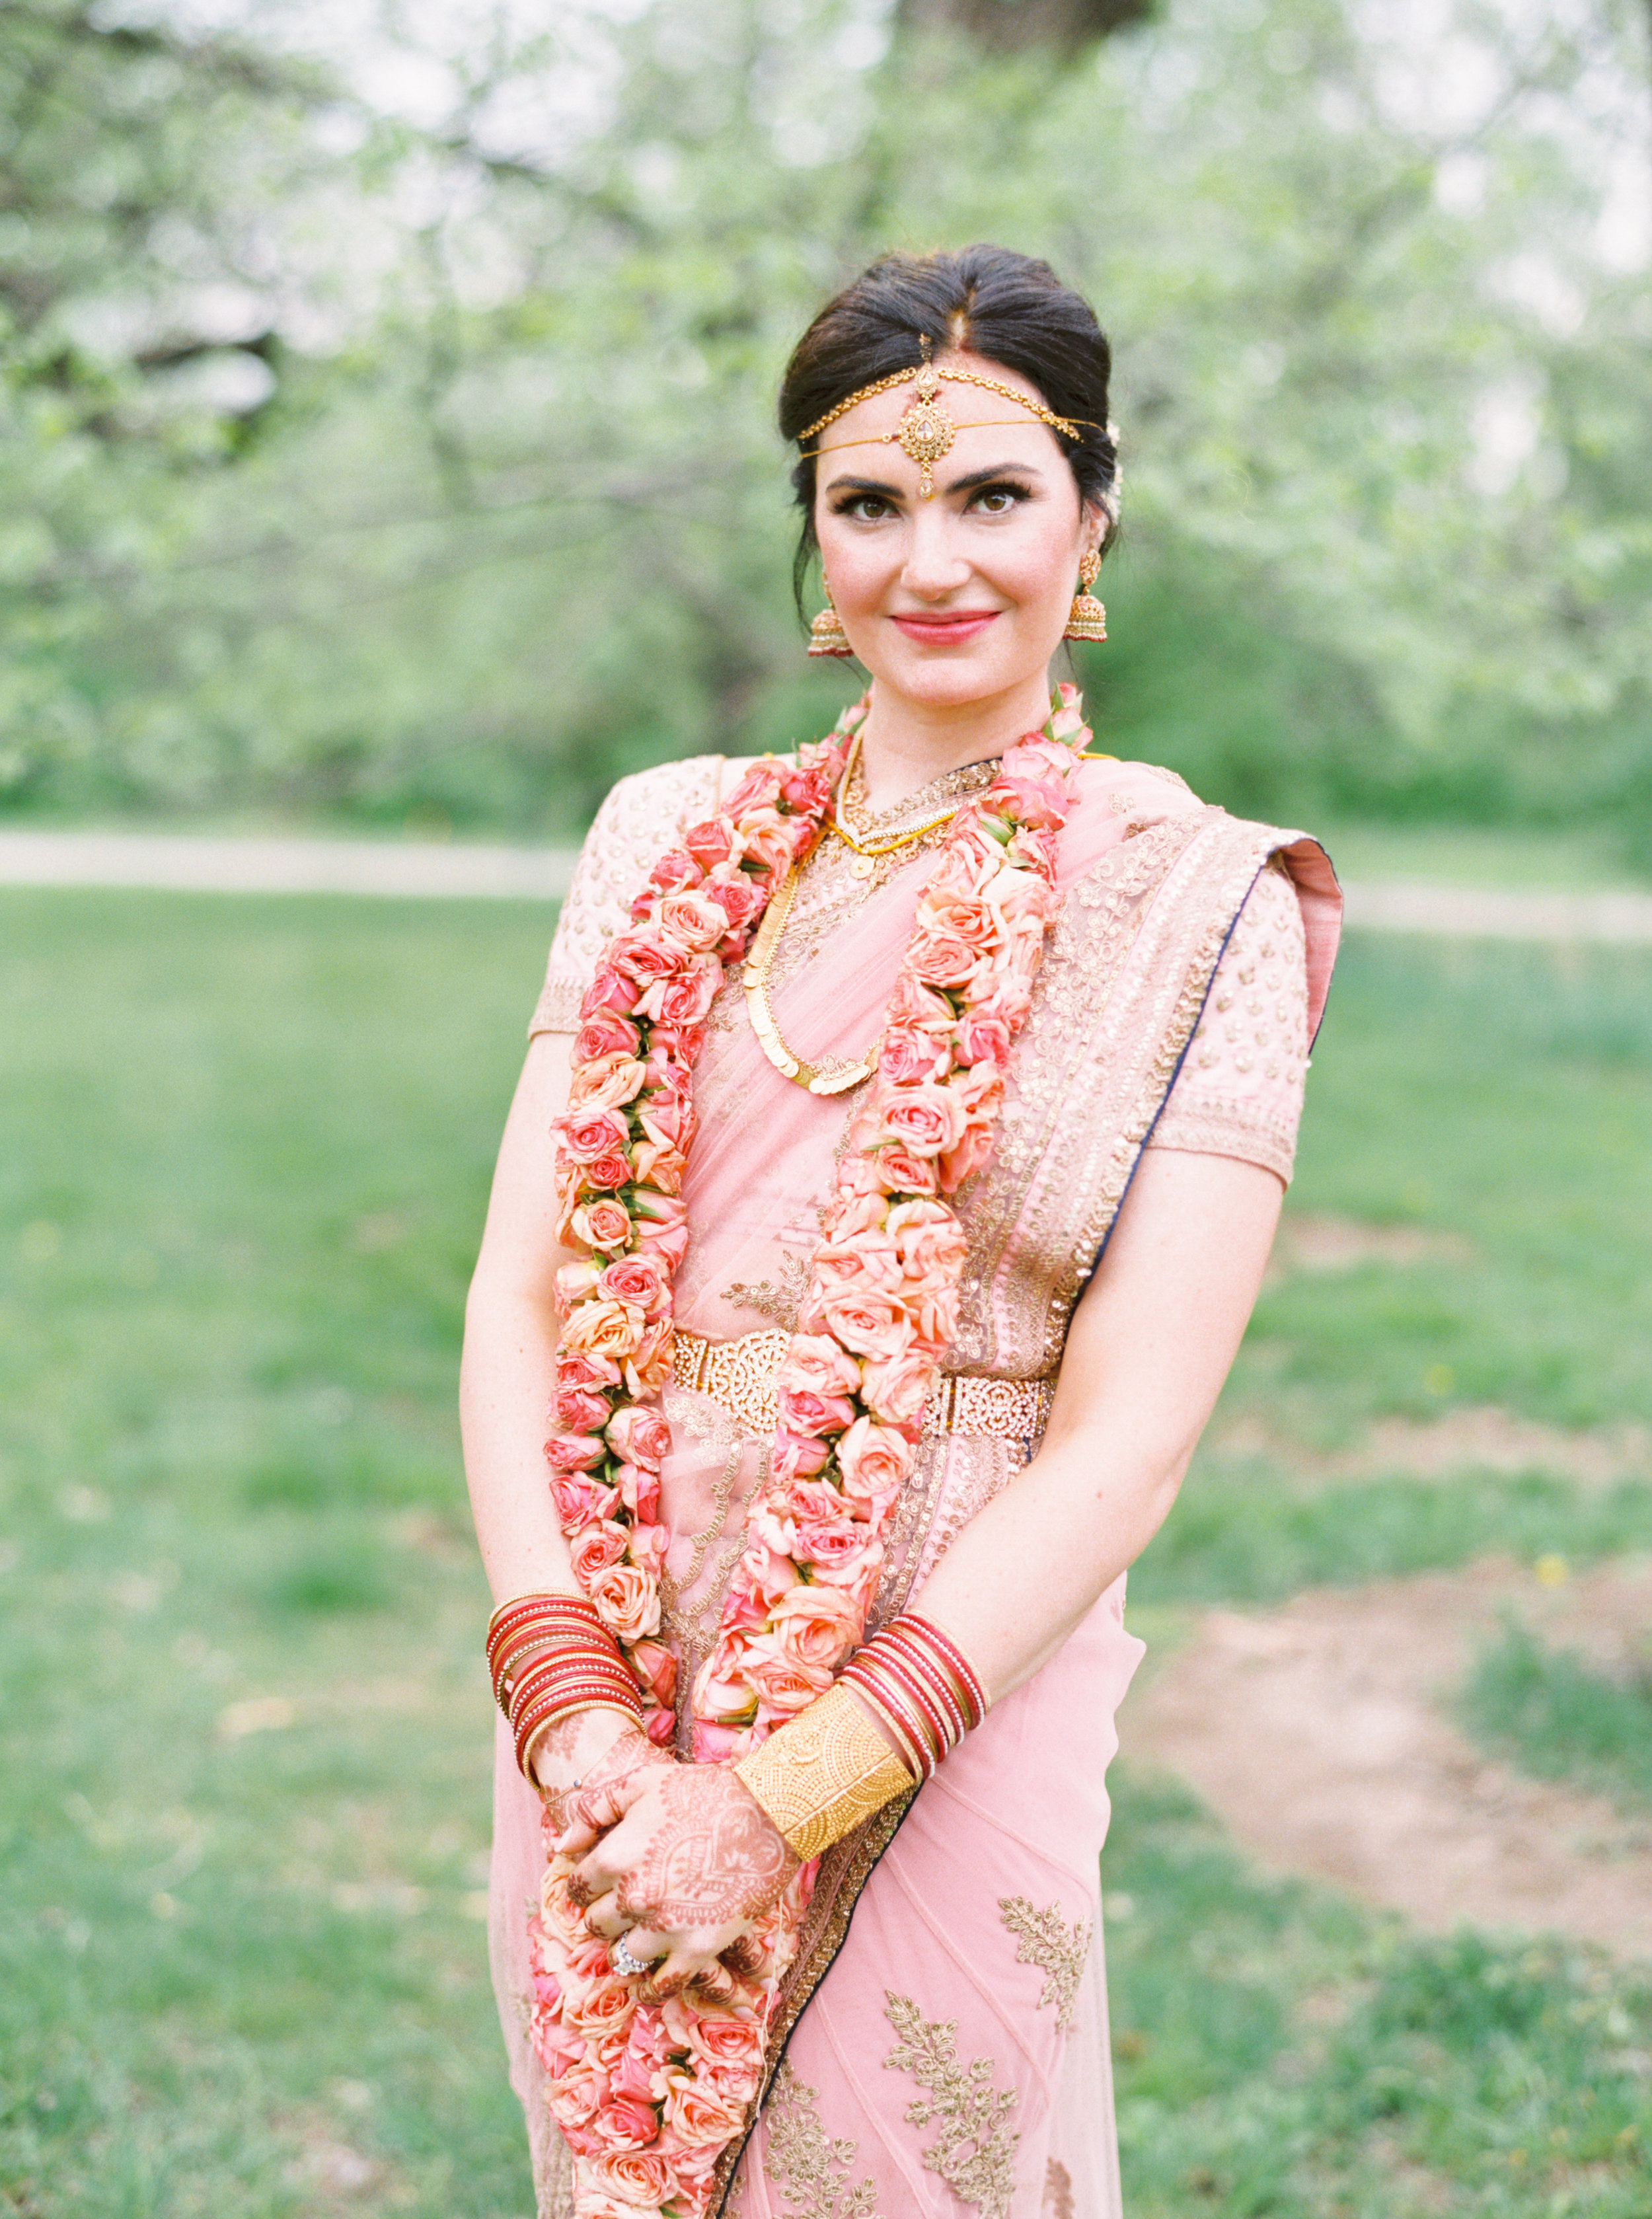 Cincinnati wedding day with south Indian motif